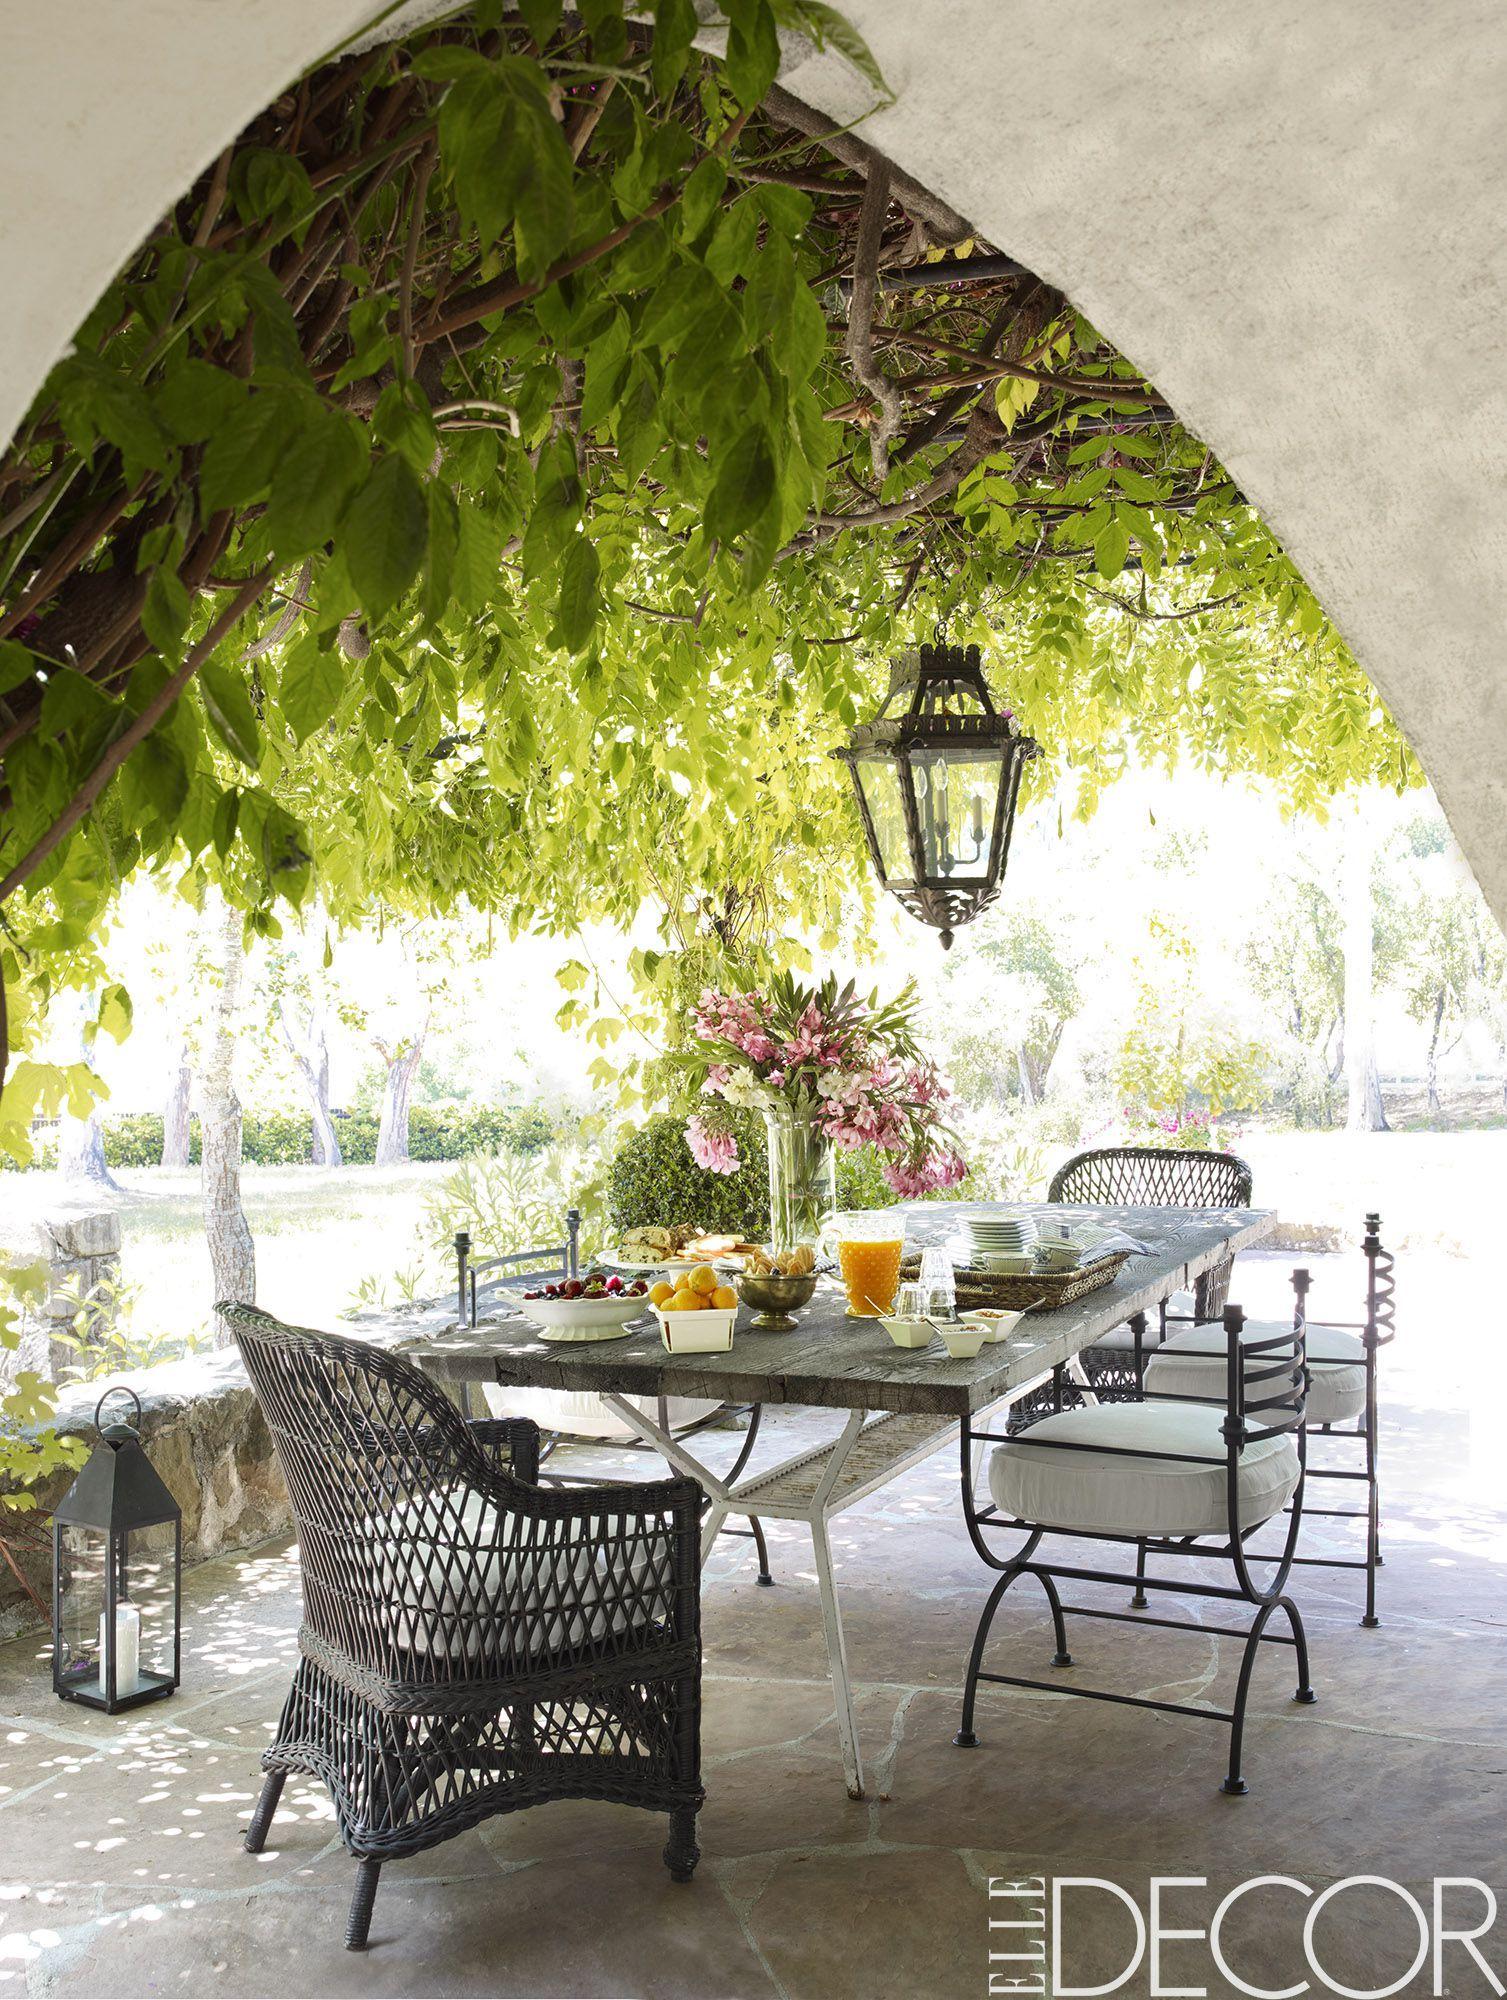 40 Best Small Patio Ideas - Small Patio Furniture & Design